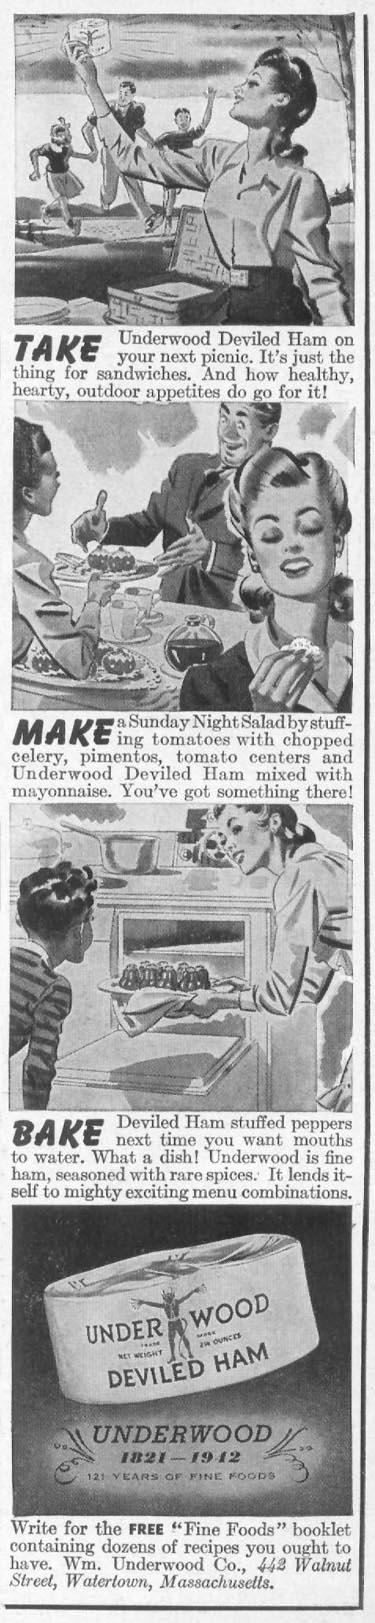 UNDERWOOD DEVILED HAM WOMAN'S DAY 09/01/1942 p. 7